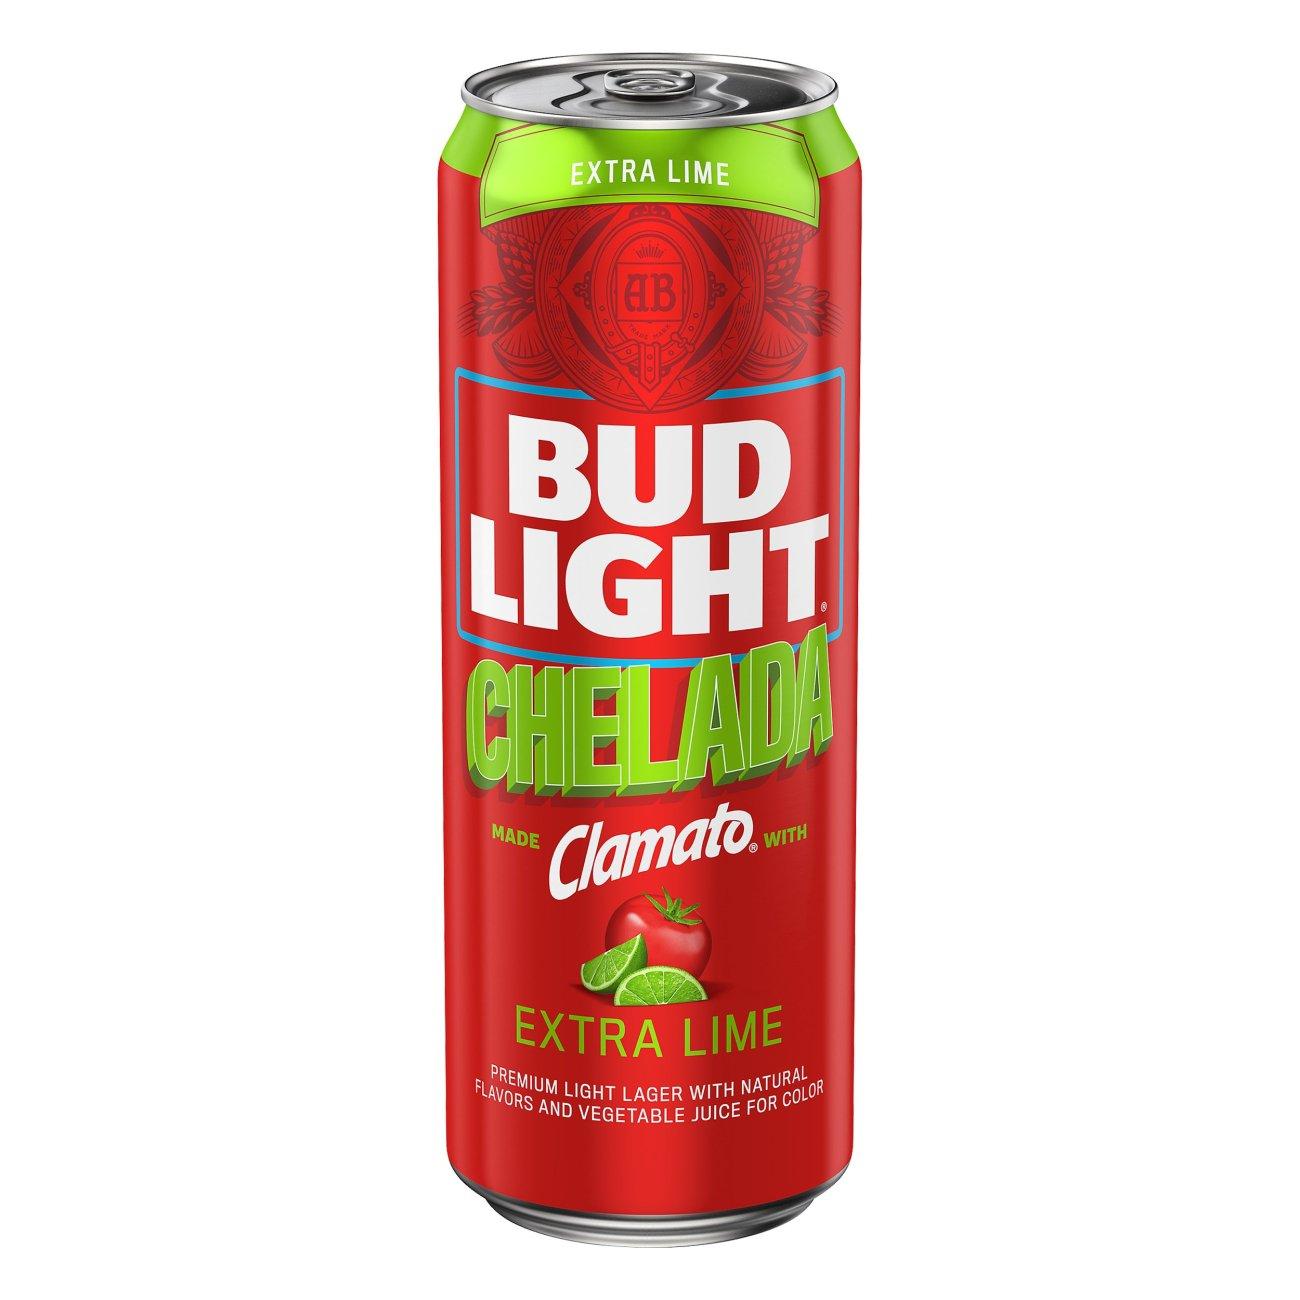 Bud Light Chelada Clamato With Salt